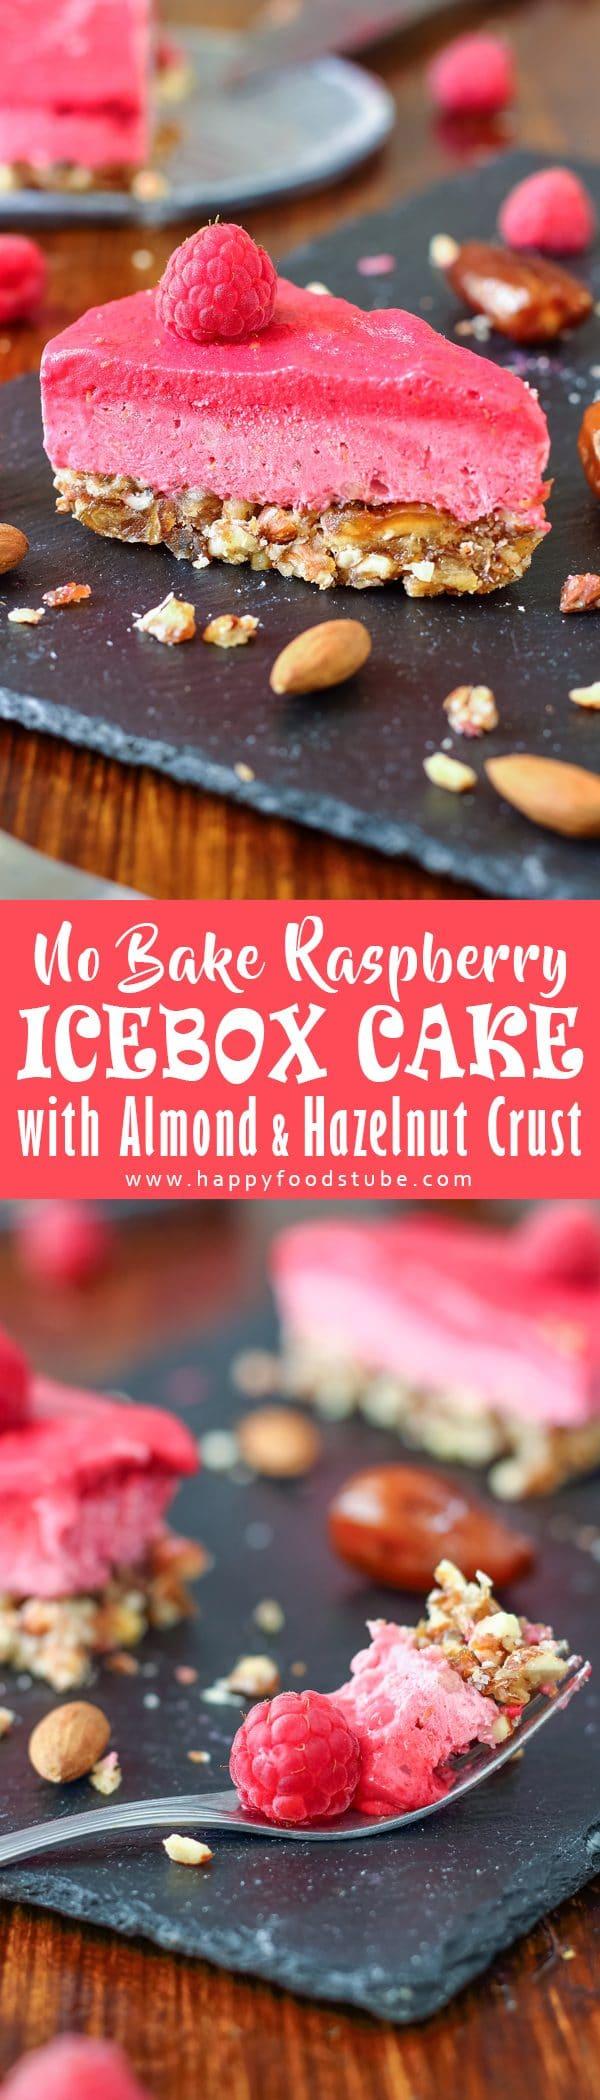 No Bake Raspberry Icebox Cake with Almond and Hazelnut Crust Recipe